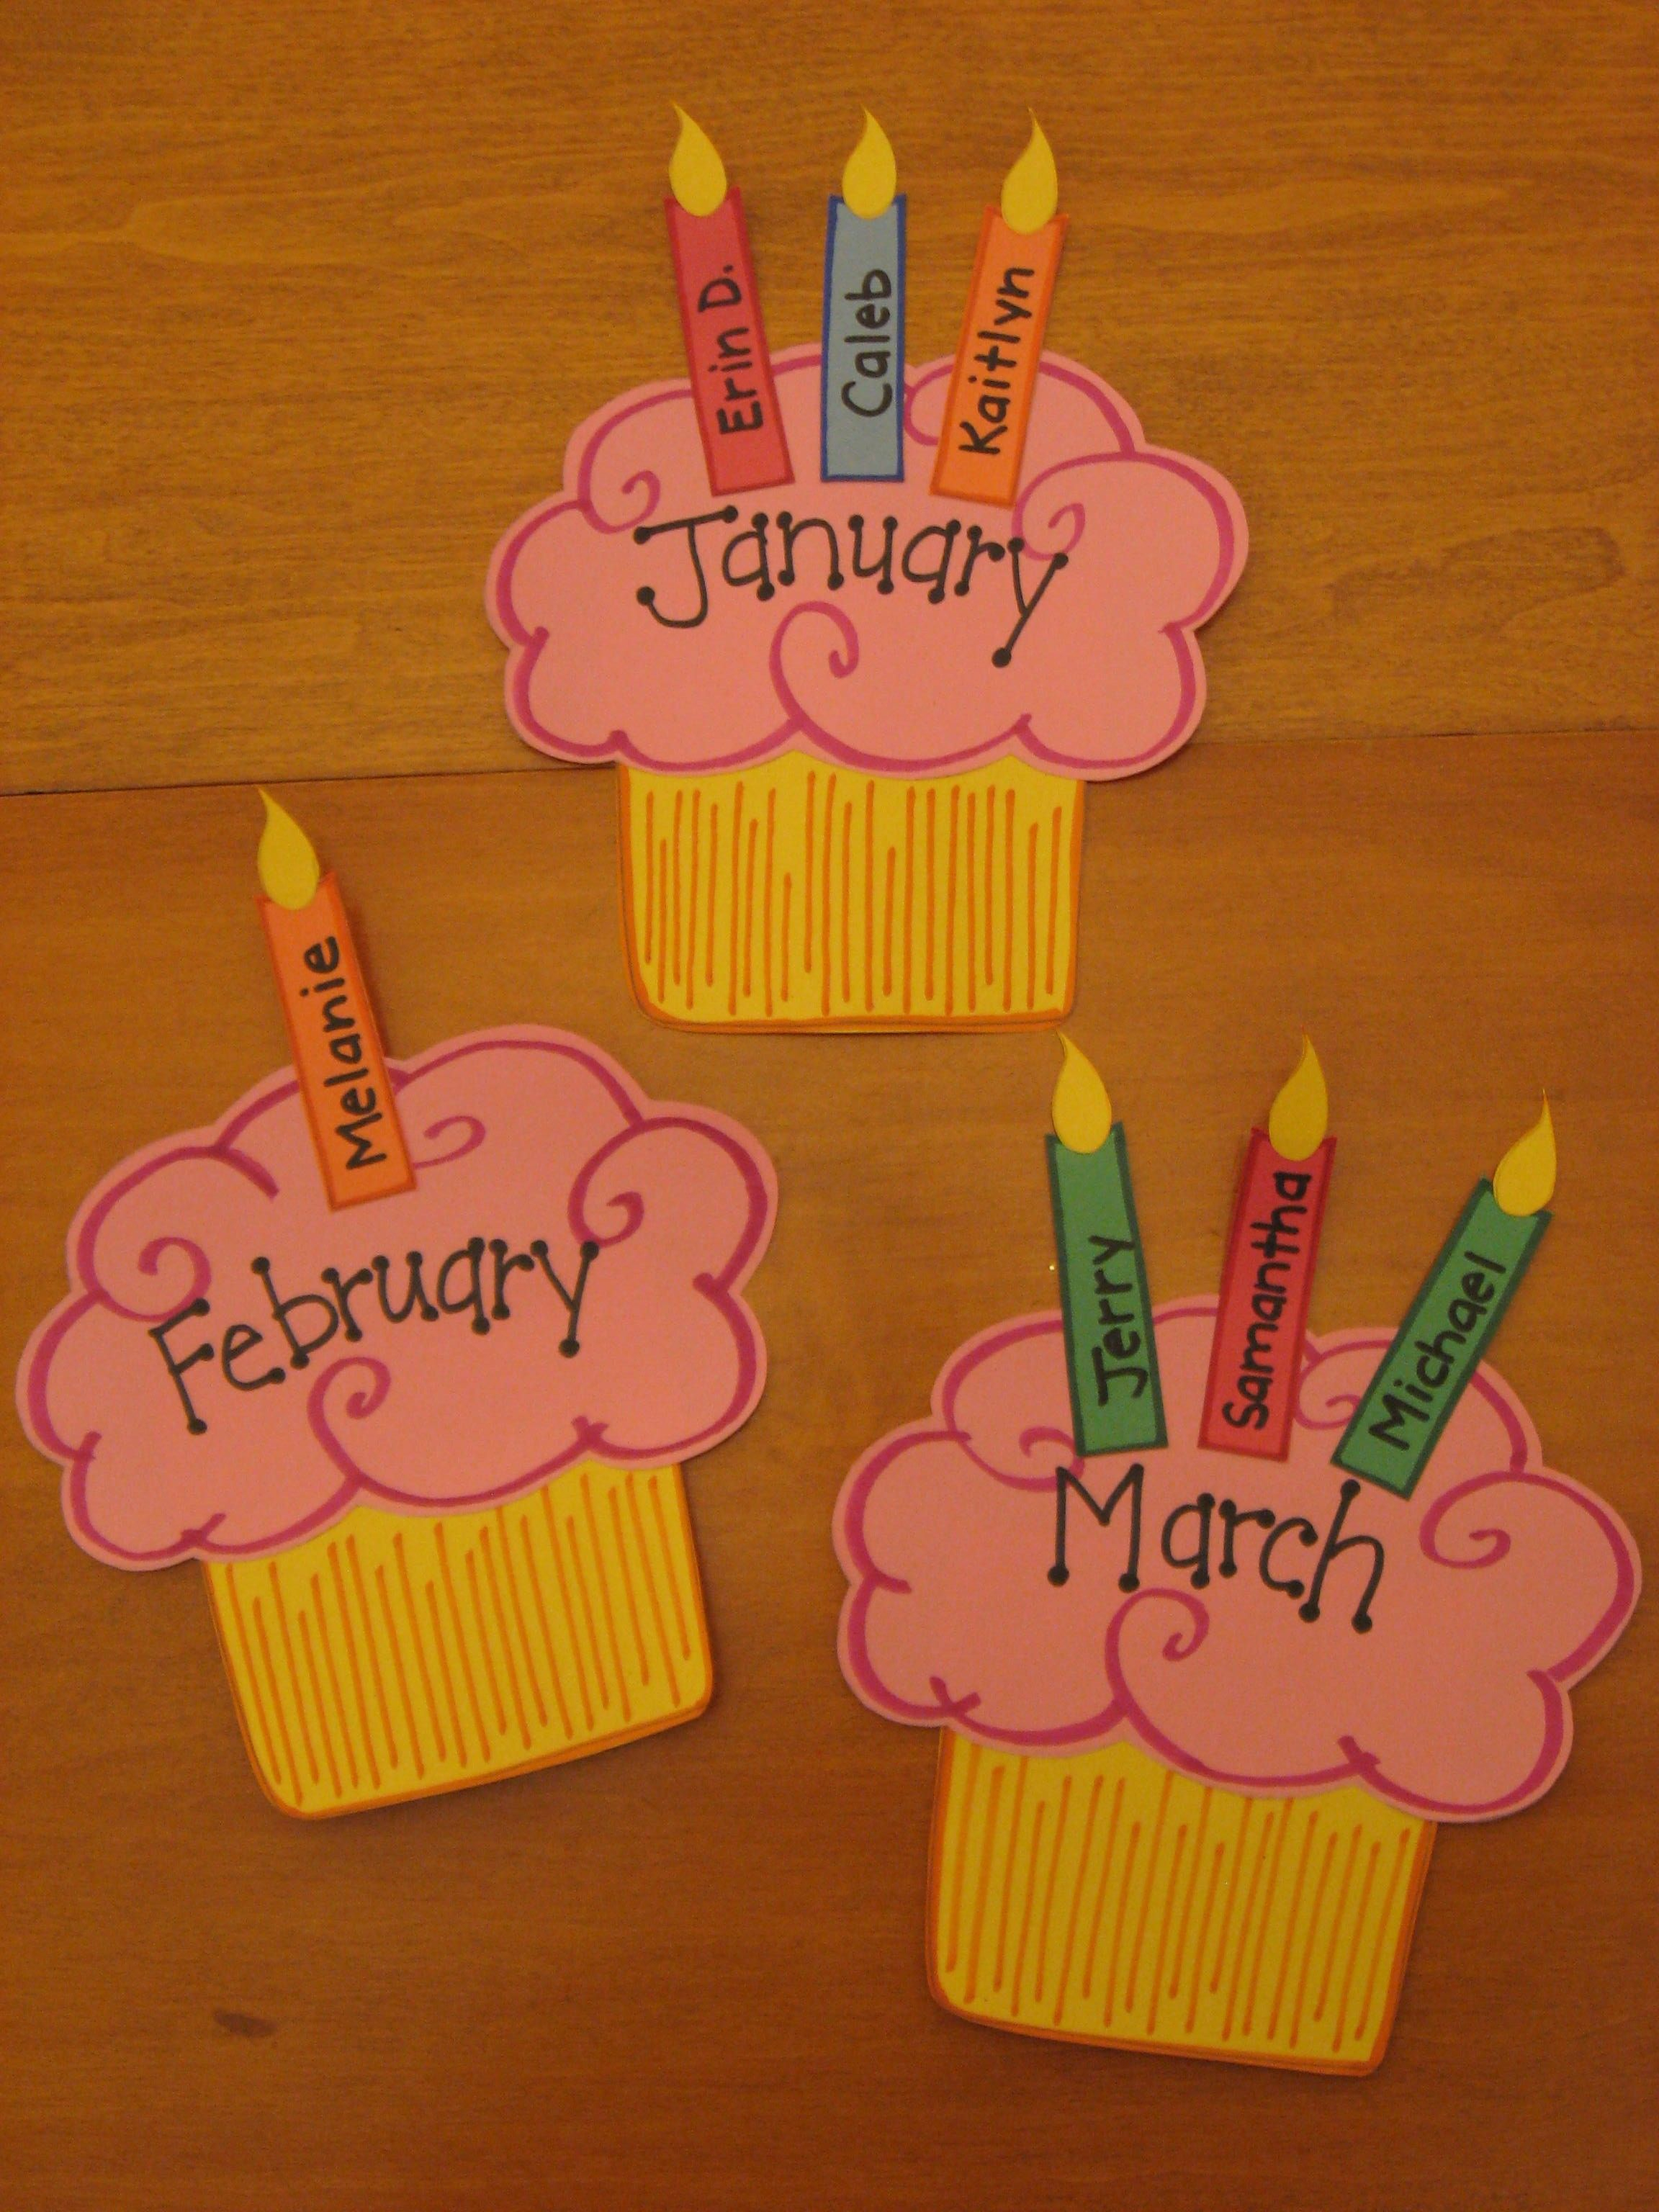 Cupcake Birthday Wall Preschool & Kindergarten Bulletin with Free Printable Cupcake Birthday Chart